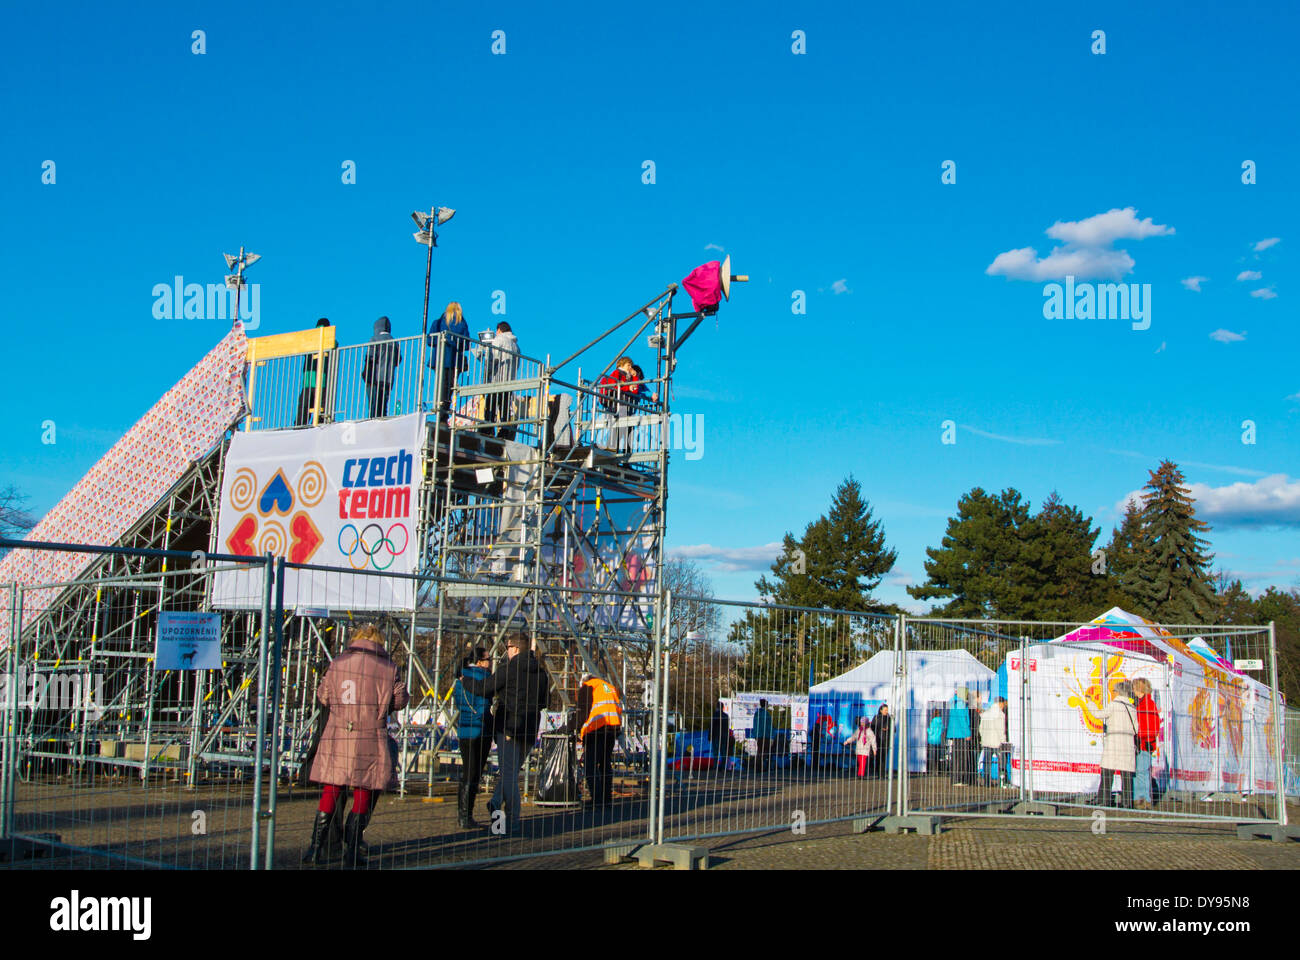 Olympic Village, Sochi 2014 winter olympics theme park, Letenske sady park, Prague, Czech Republic, Europe - Stock Image